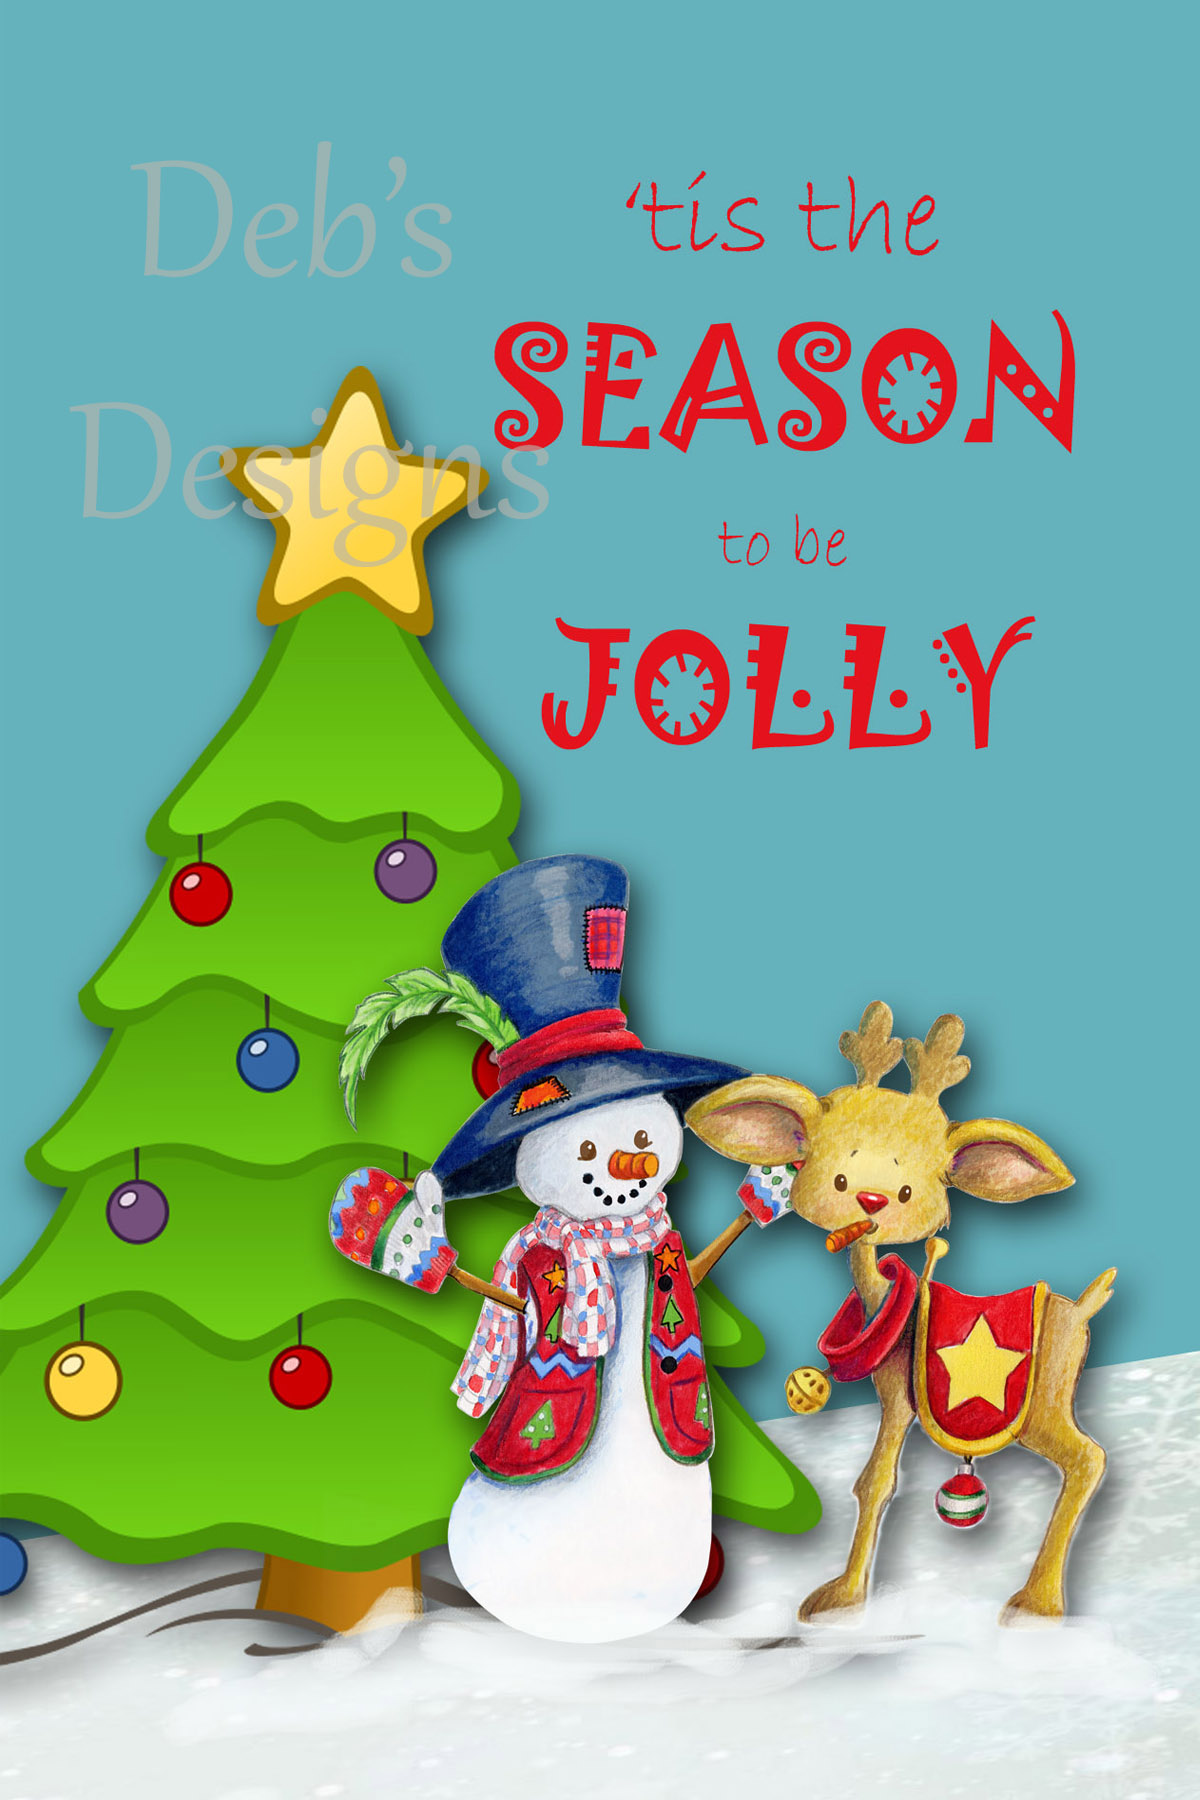 Digital Snowman Christmas Card, Printable Digital Christmas Card, Photo Christmas Card, Personalized Christmas Card, Happy Holidays Card example image 4